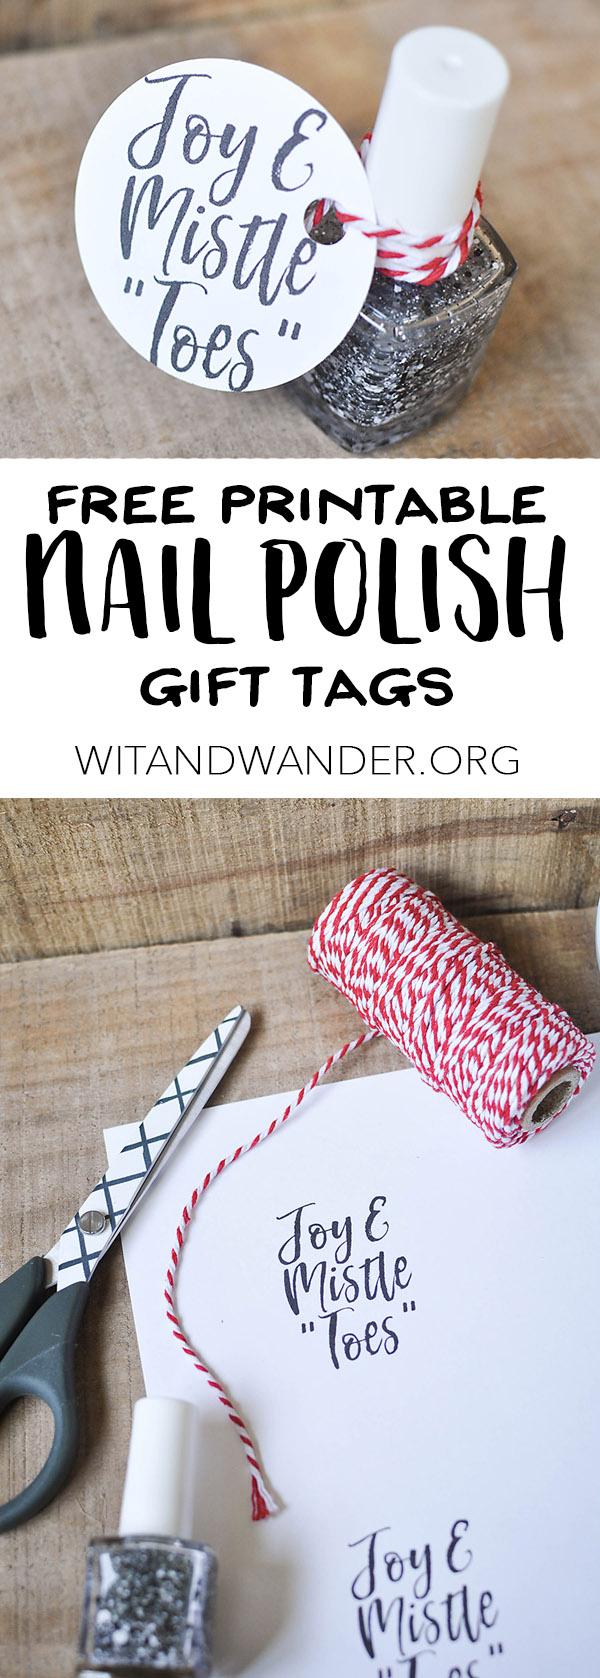 Free printable nail polish gift tags our handcrafted life free printable nail polish gift tags wit wander negle Choice Image